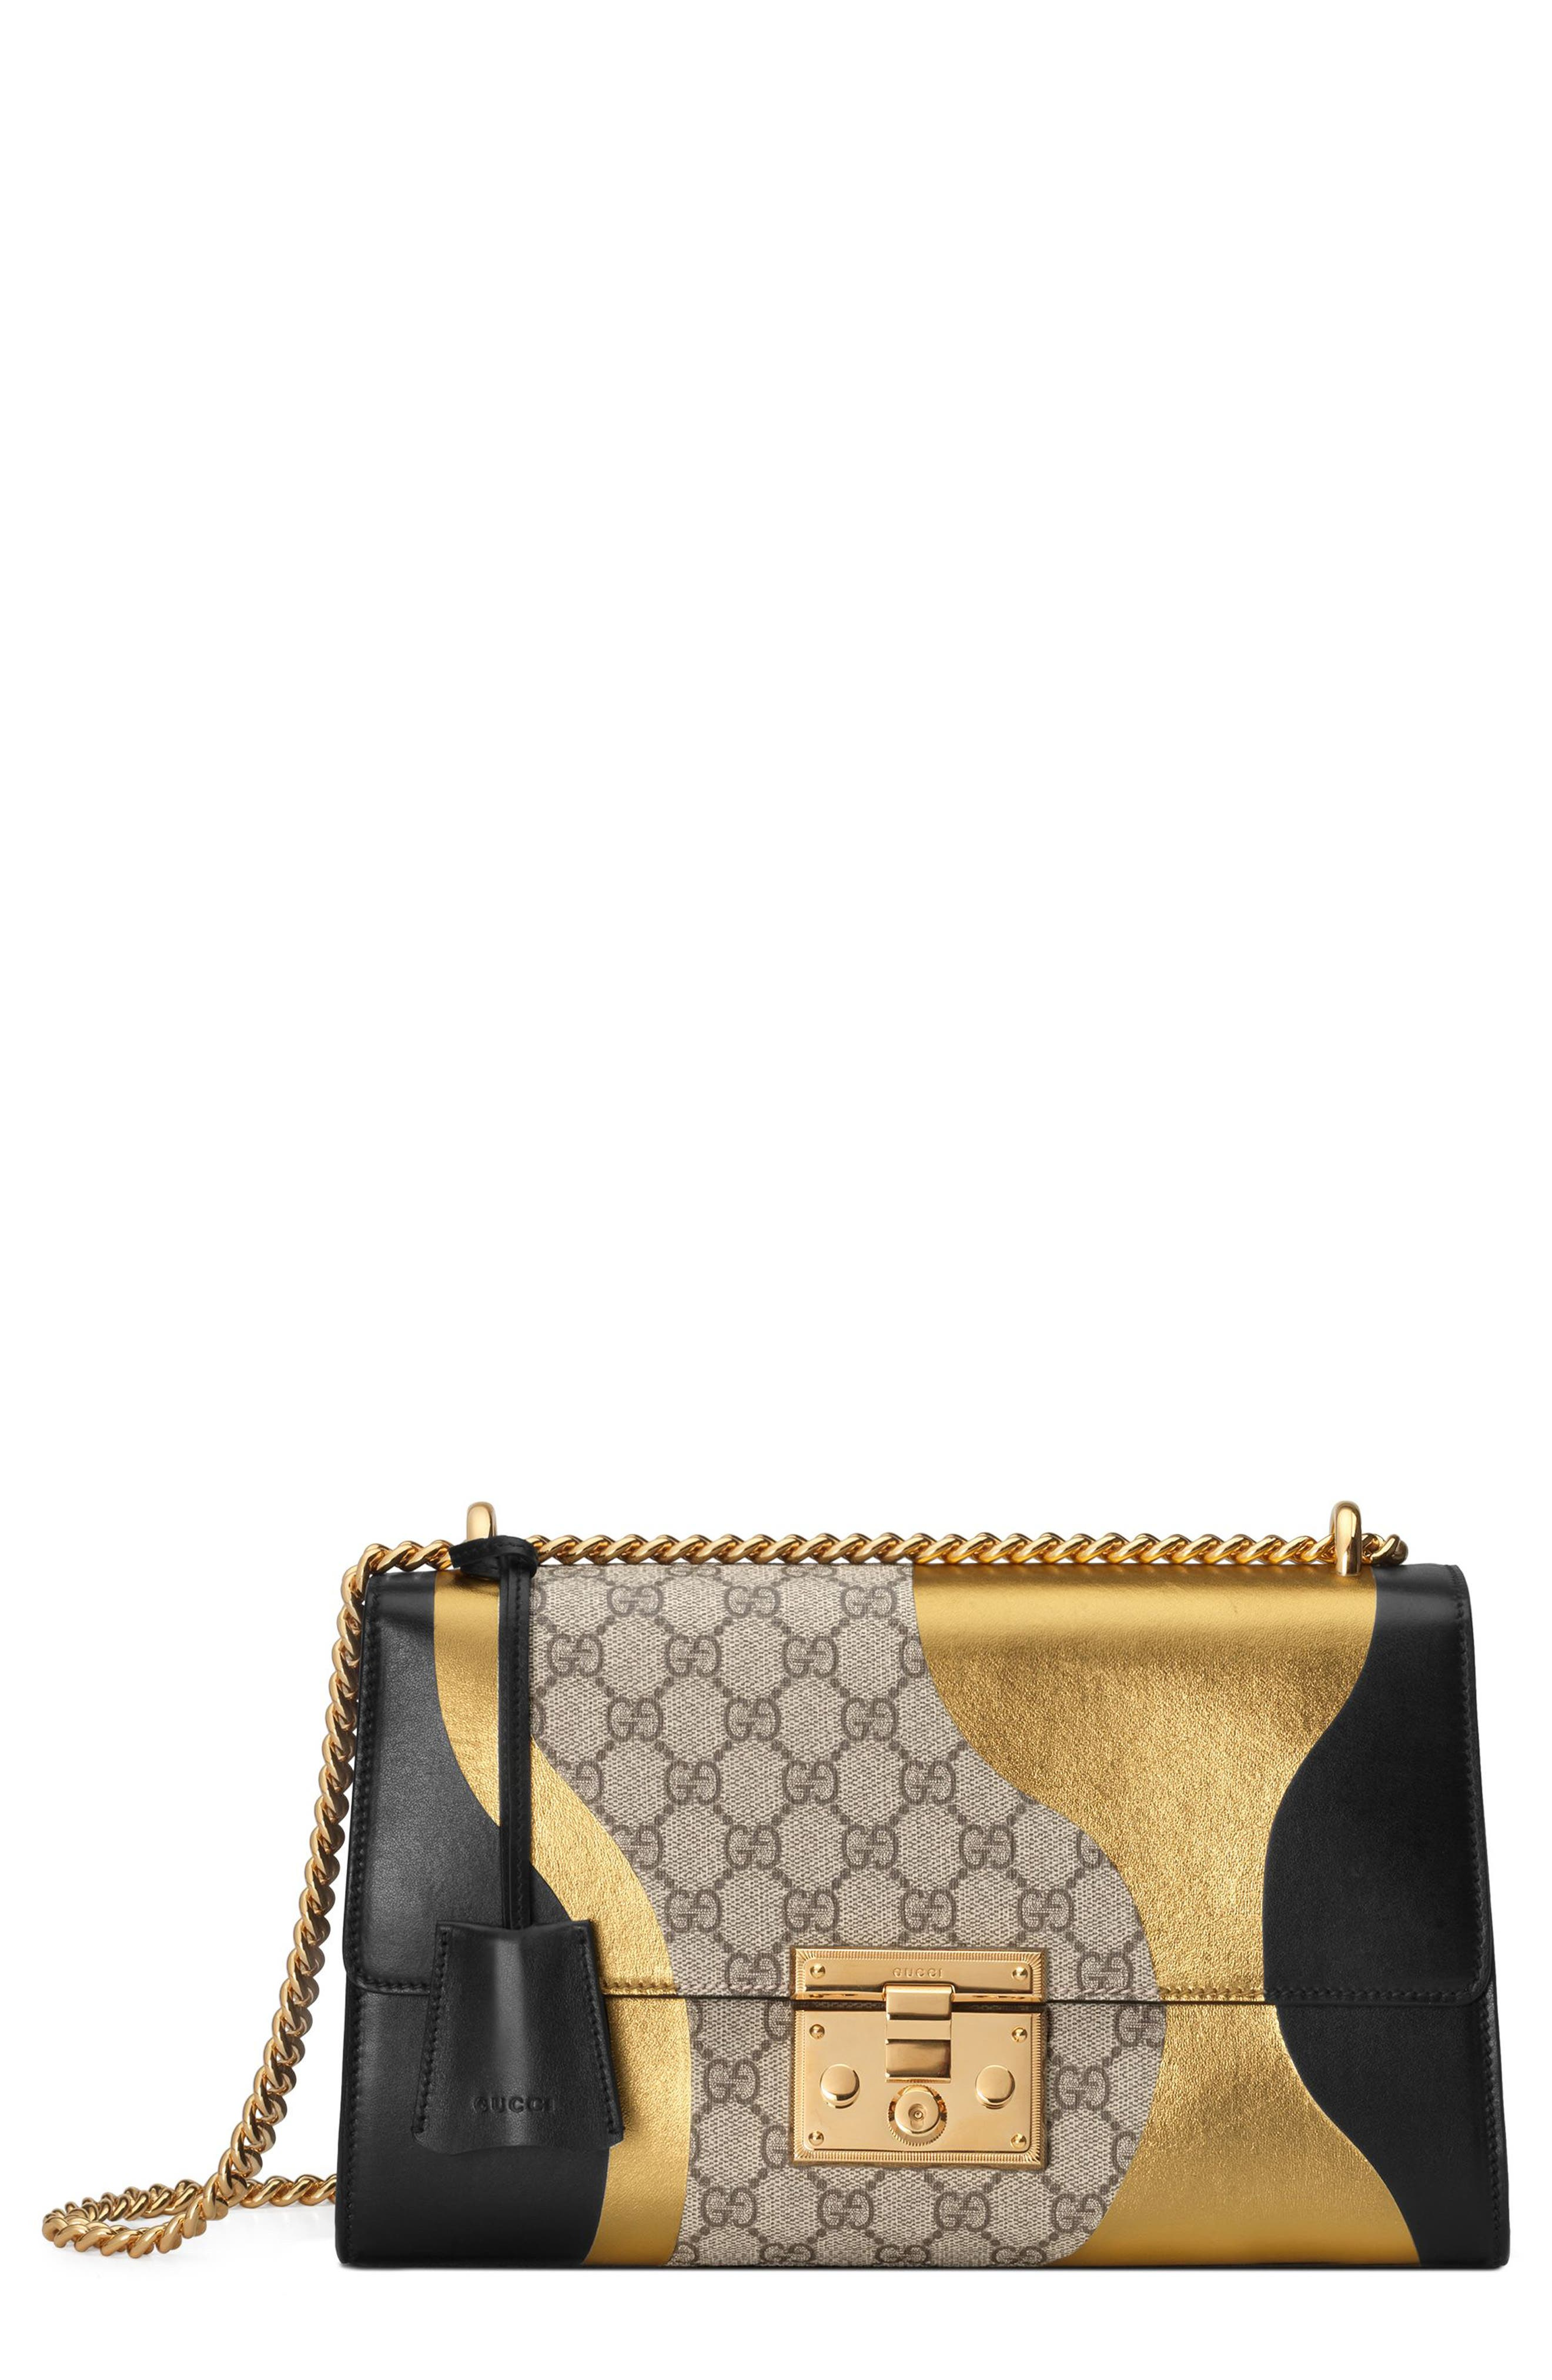 Main Image - Gucci Medium Padlock GG Supreme Canvas & Leather Shoulder Bag